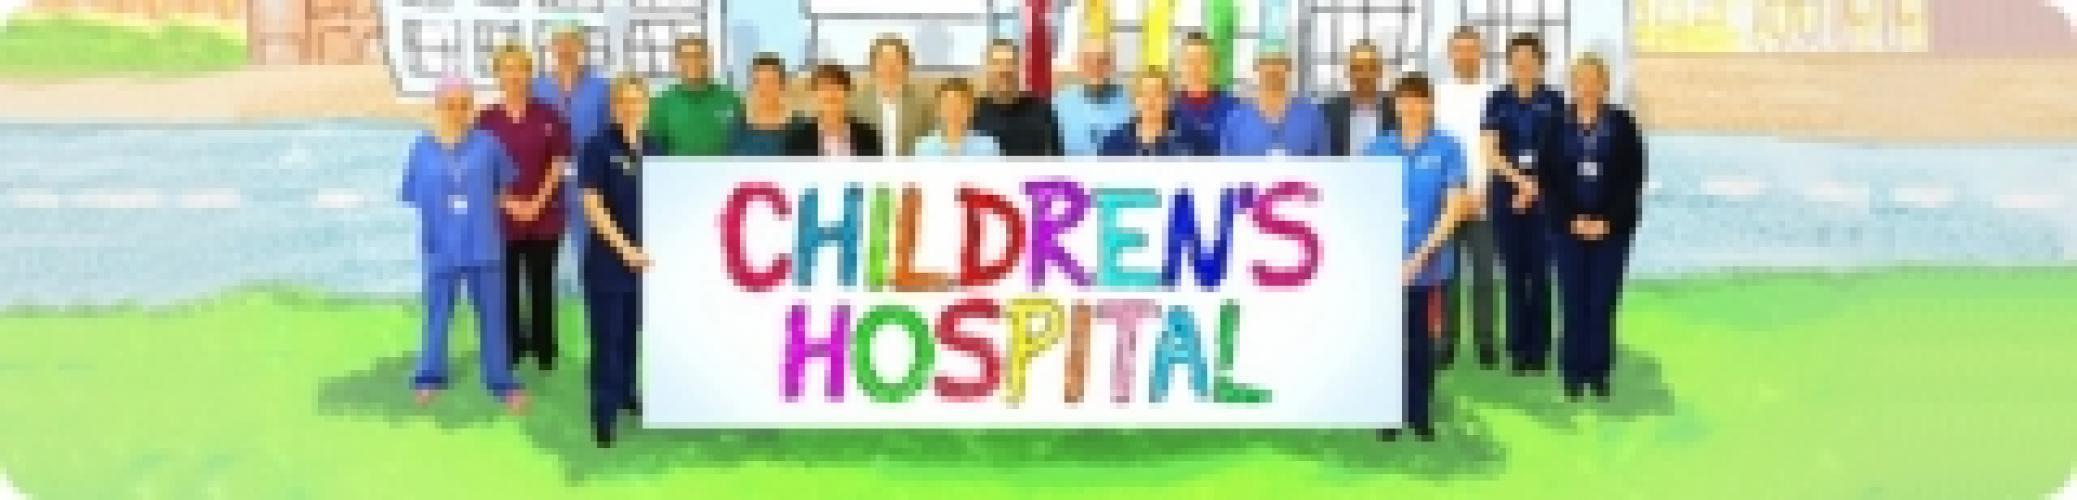 Children's Hospital (UK) next episode air date poster